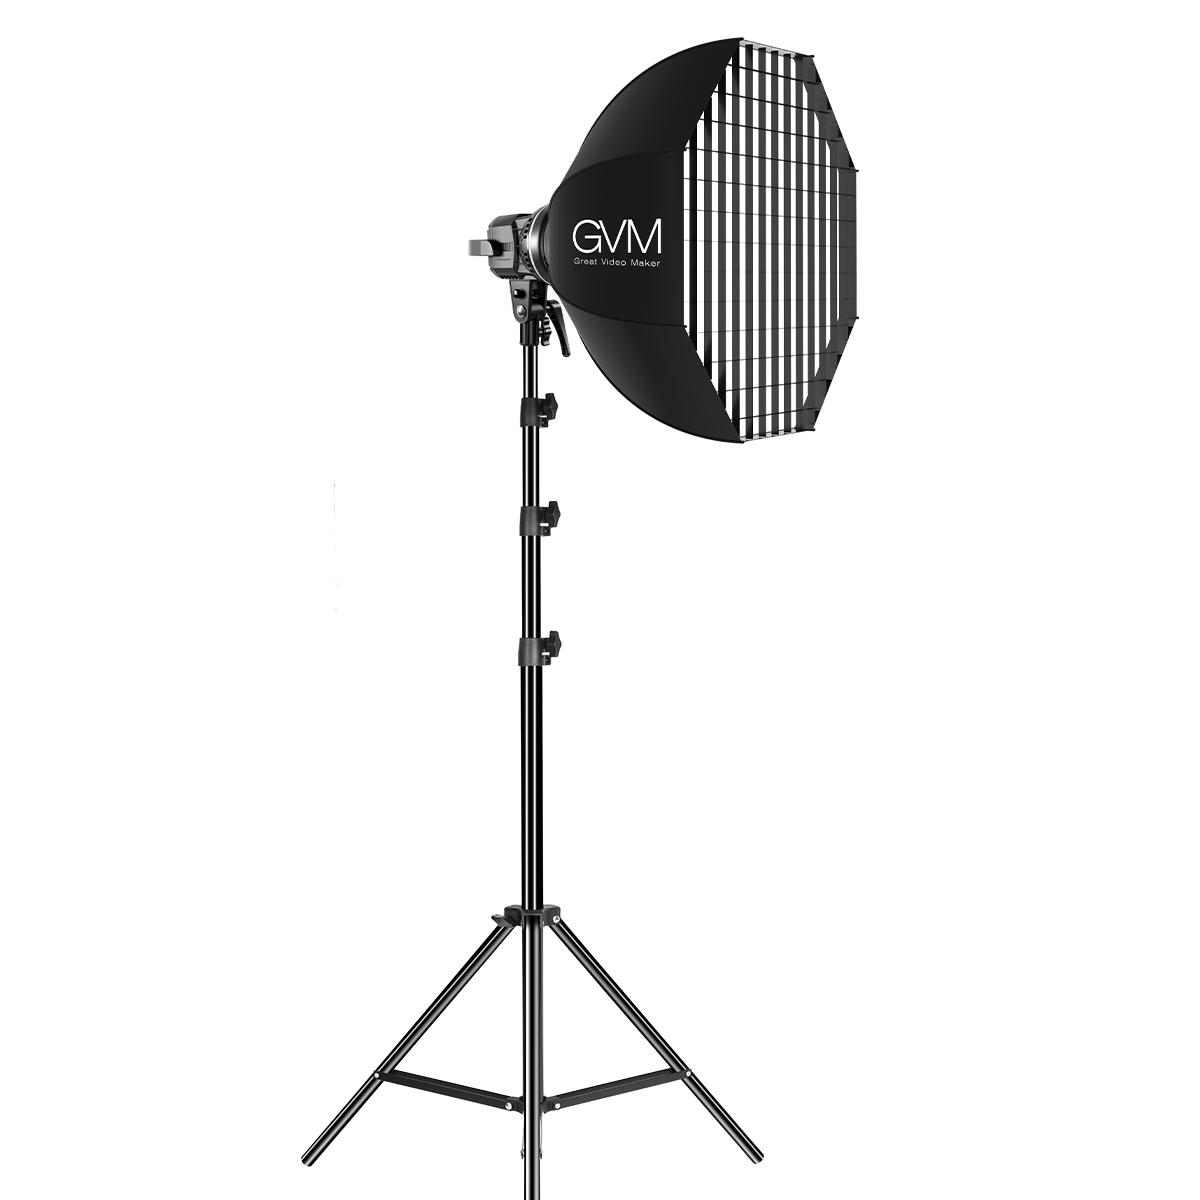 GVM P80S-2 80W LED Spotlight Daylight Kit with Softbox